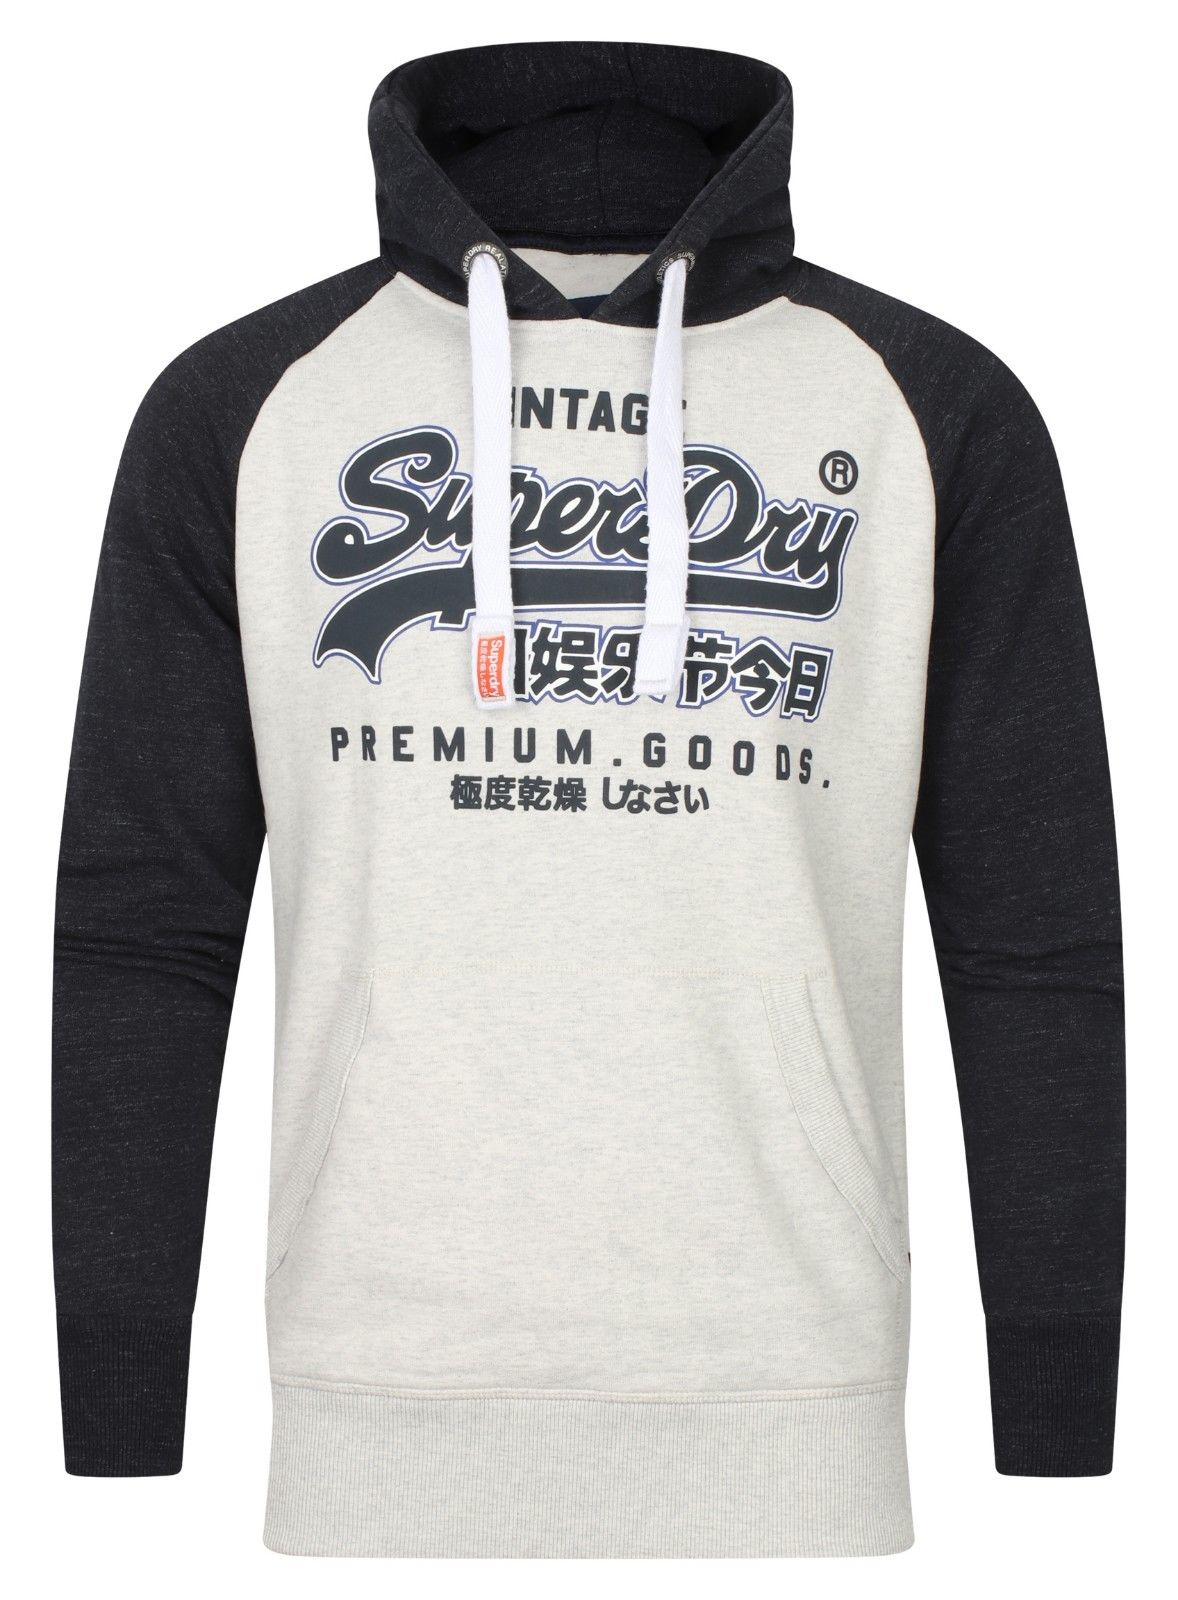 Van Fashion For Less Premium Goods Raglan Stadium Silver/Bass Blue Prijsvergelijk nu!